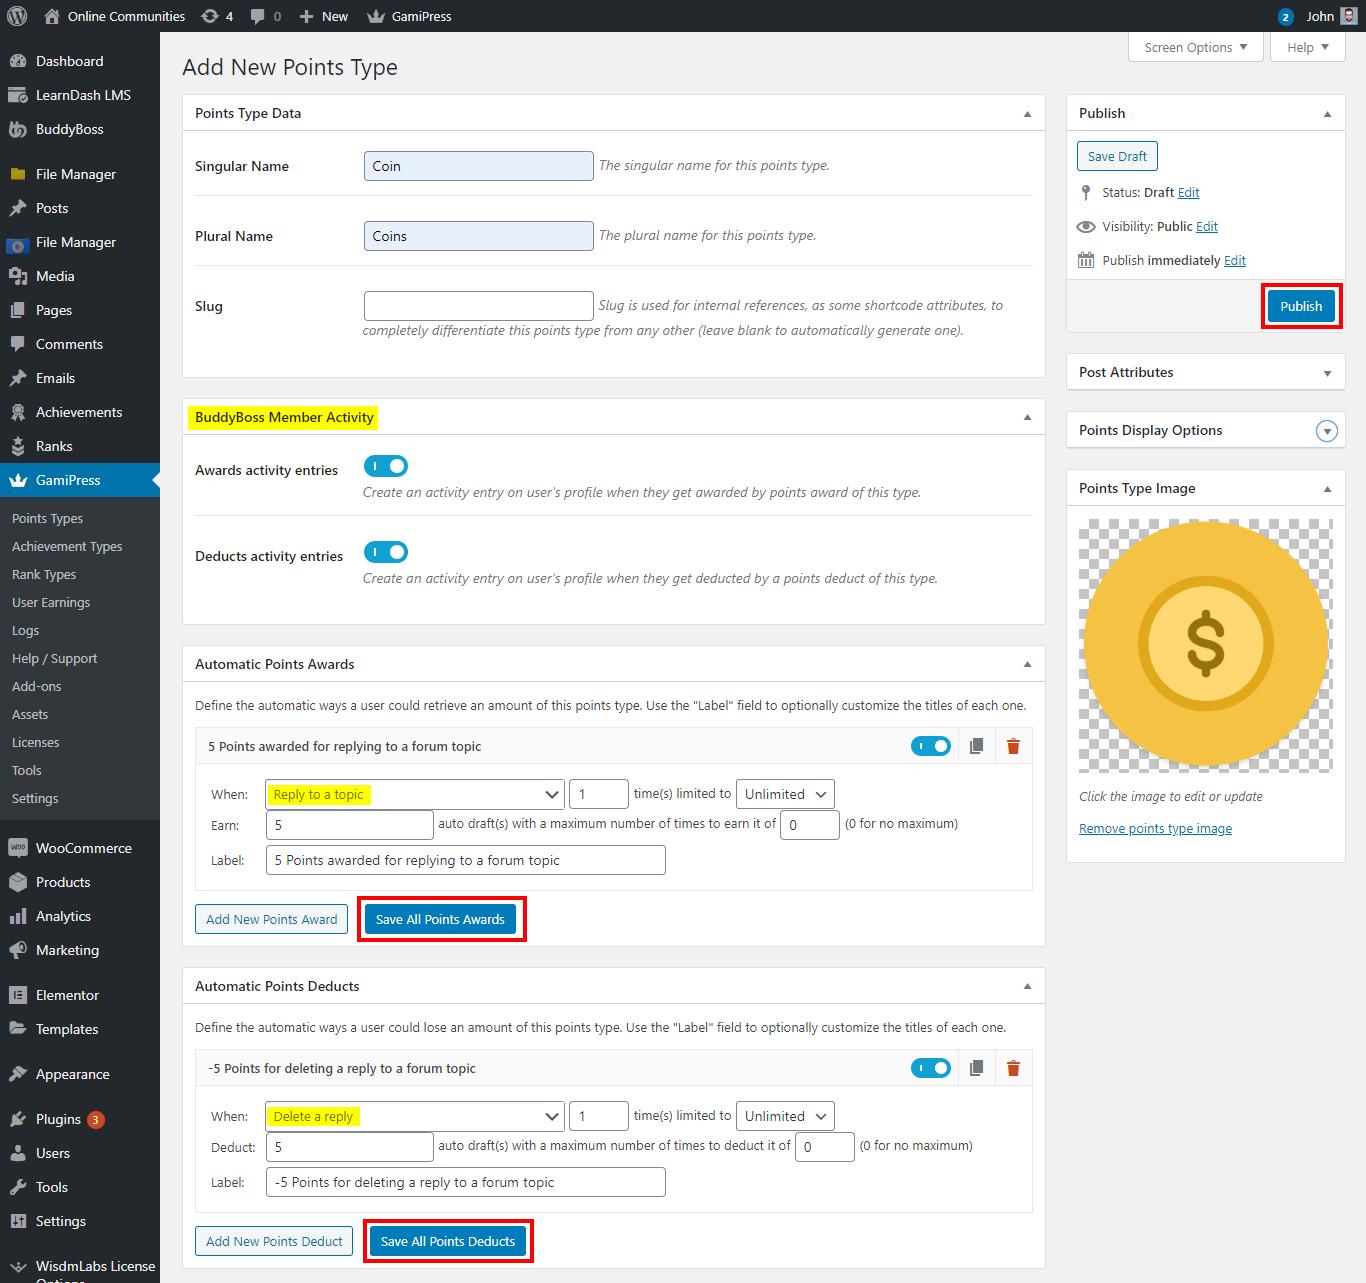 GamiPress + BuddyBoss Integration - Creating a new point type for BuddyBoss events